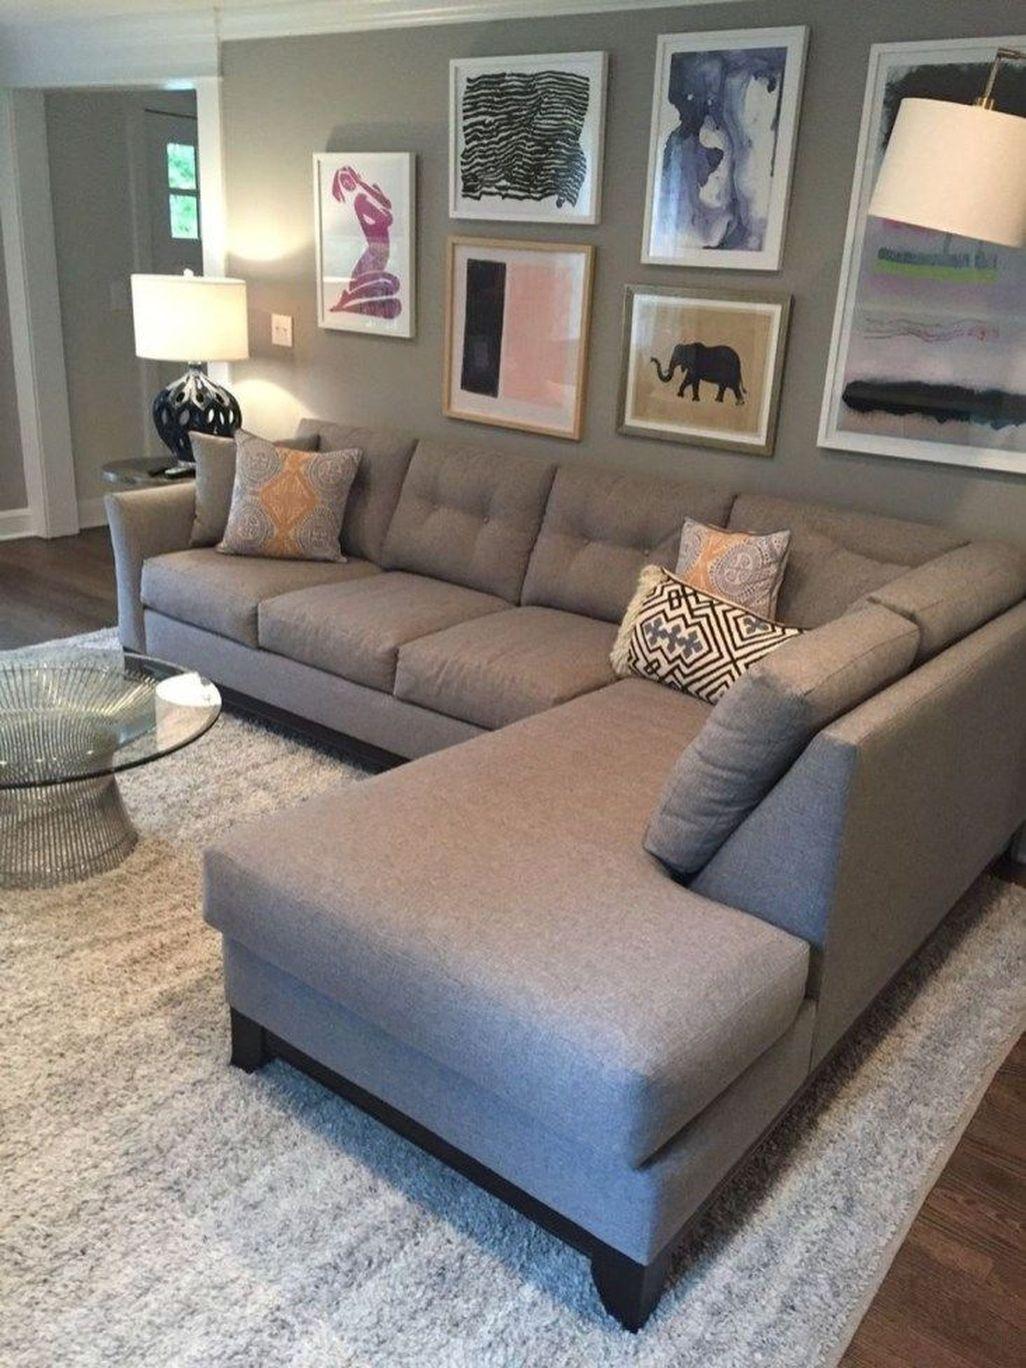 Lovely Colourful Sofa Ideas 04 Jpg 1026 1368 Small Living Room